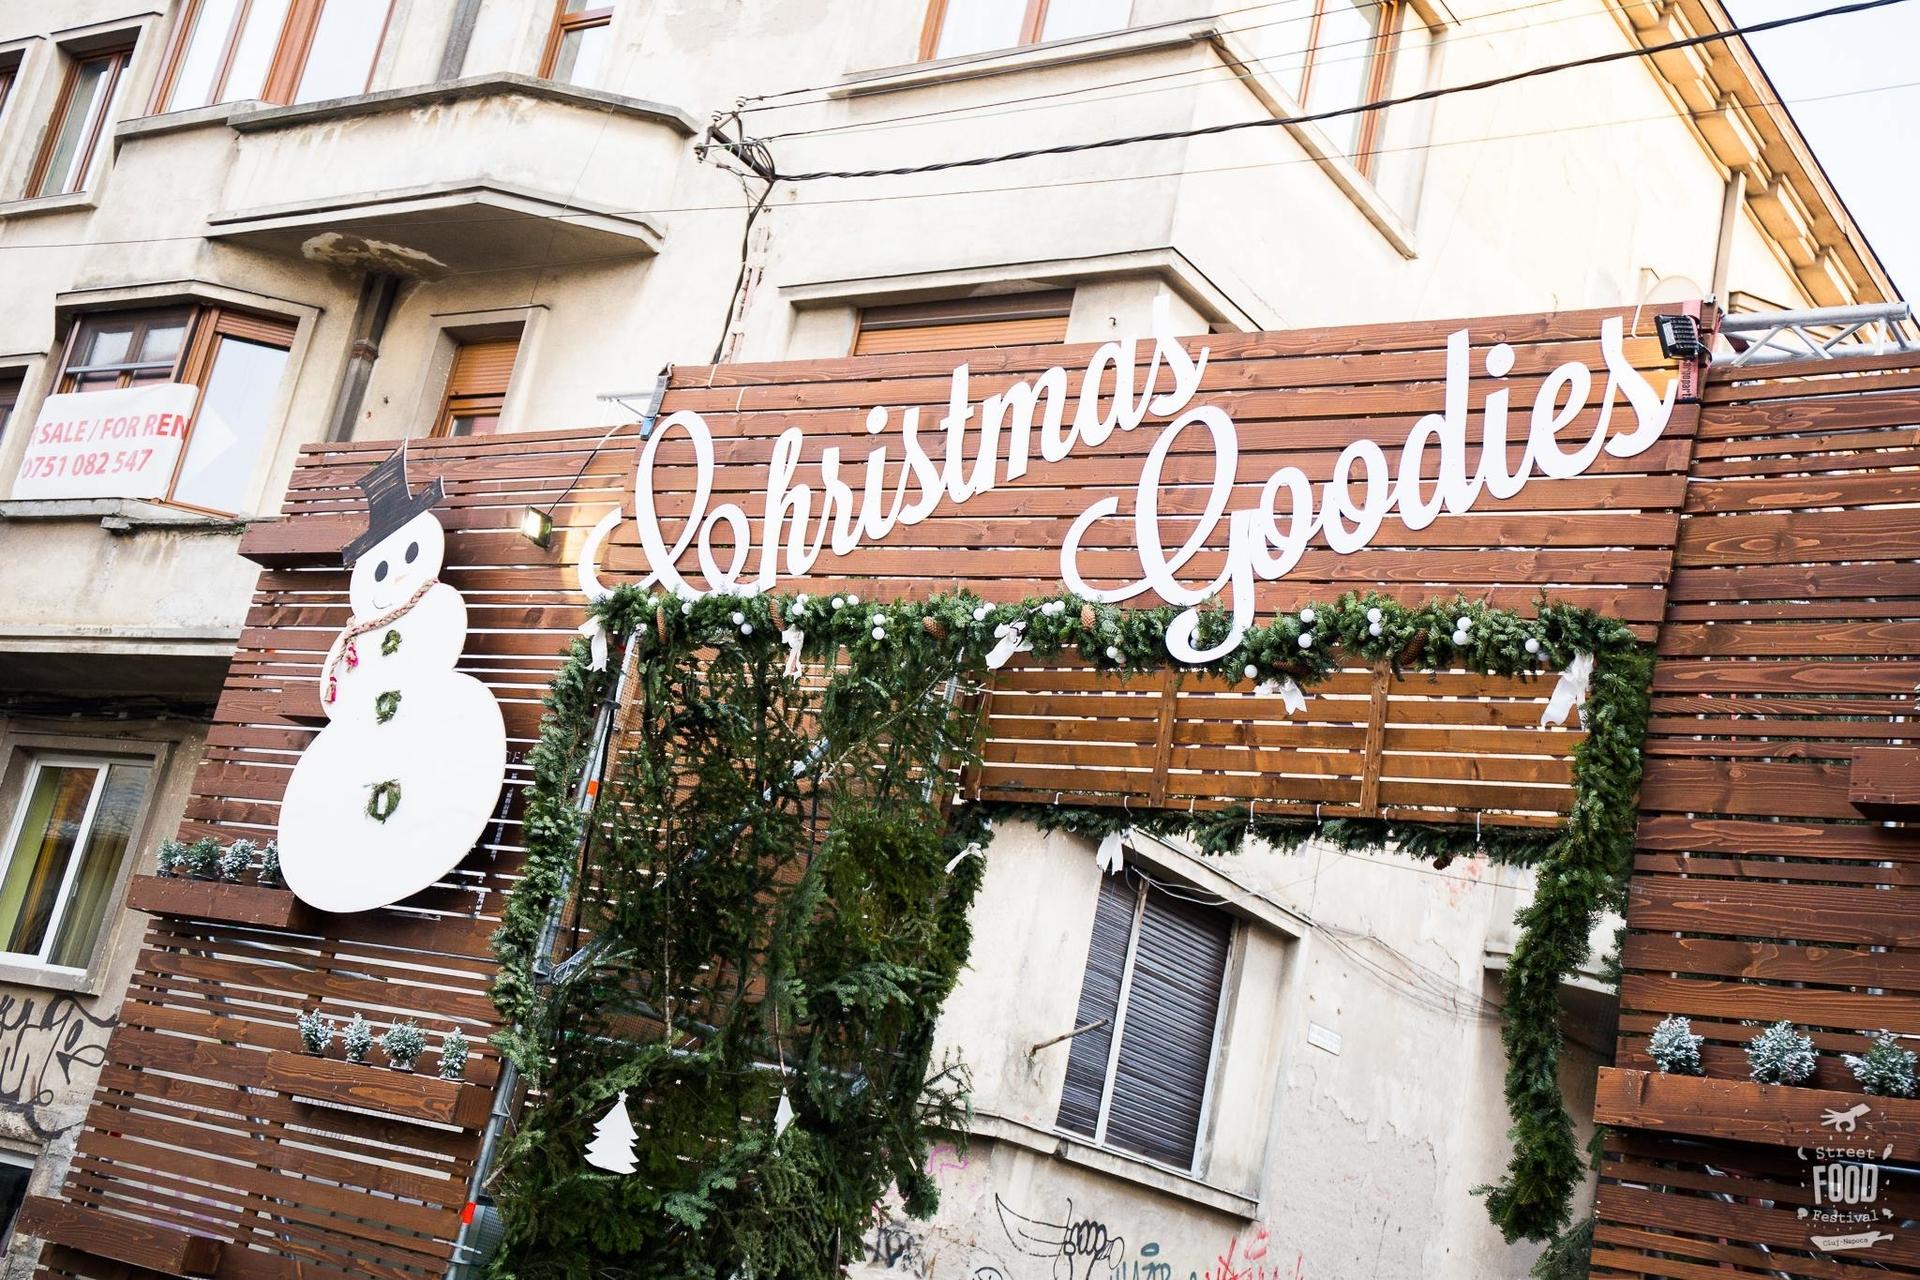 Street FOOD Festival Christmas Goodies revine la Cluj